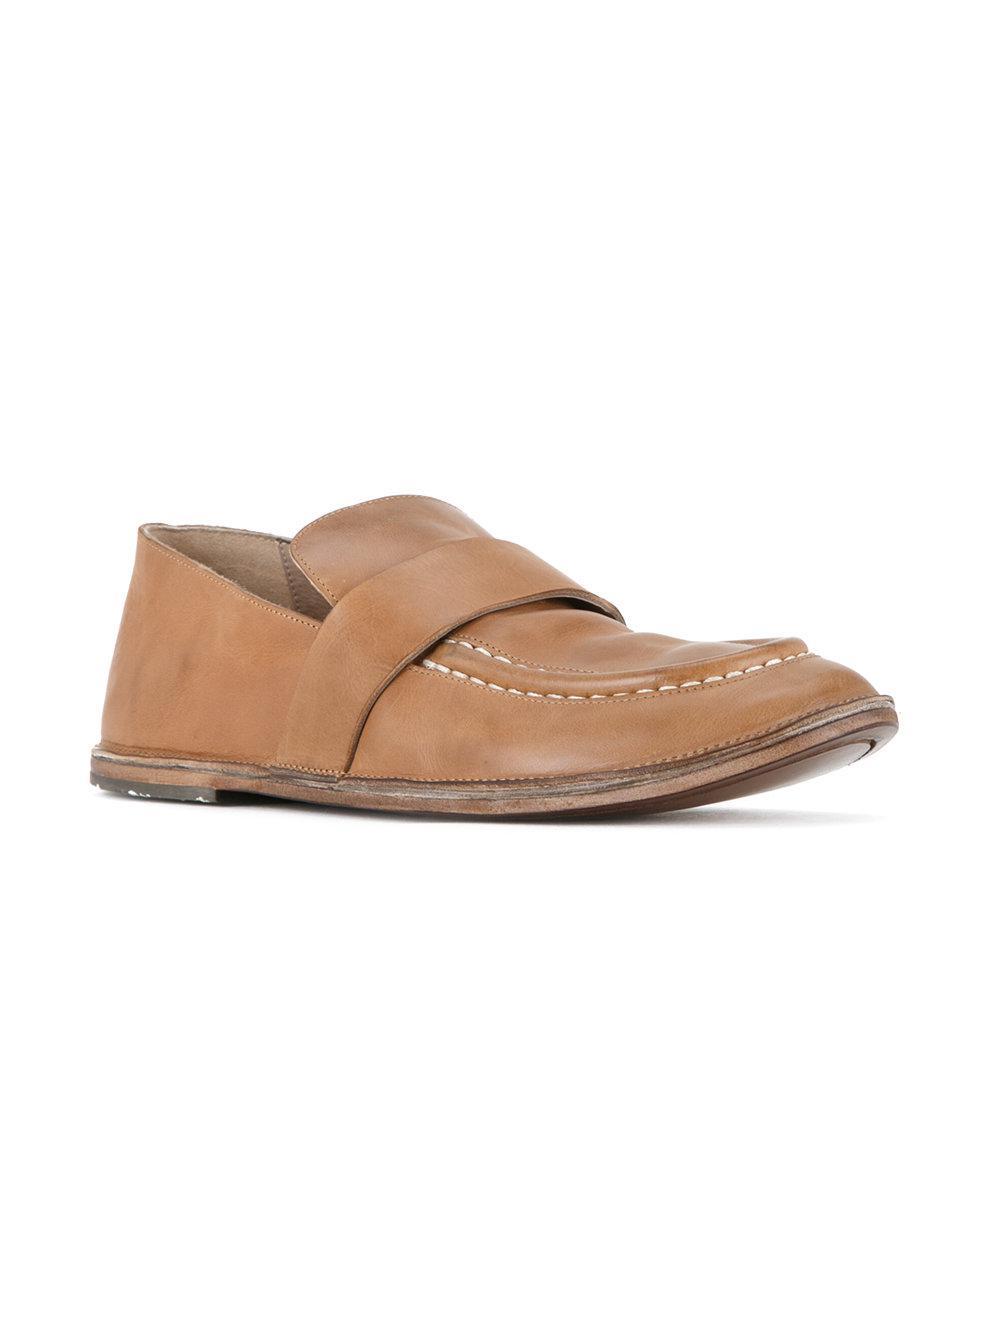 Strasacco loafers - Brown Mars��ll bClznKa